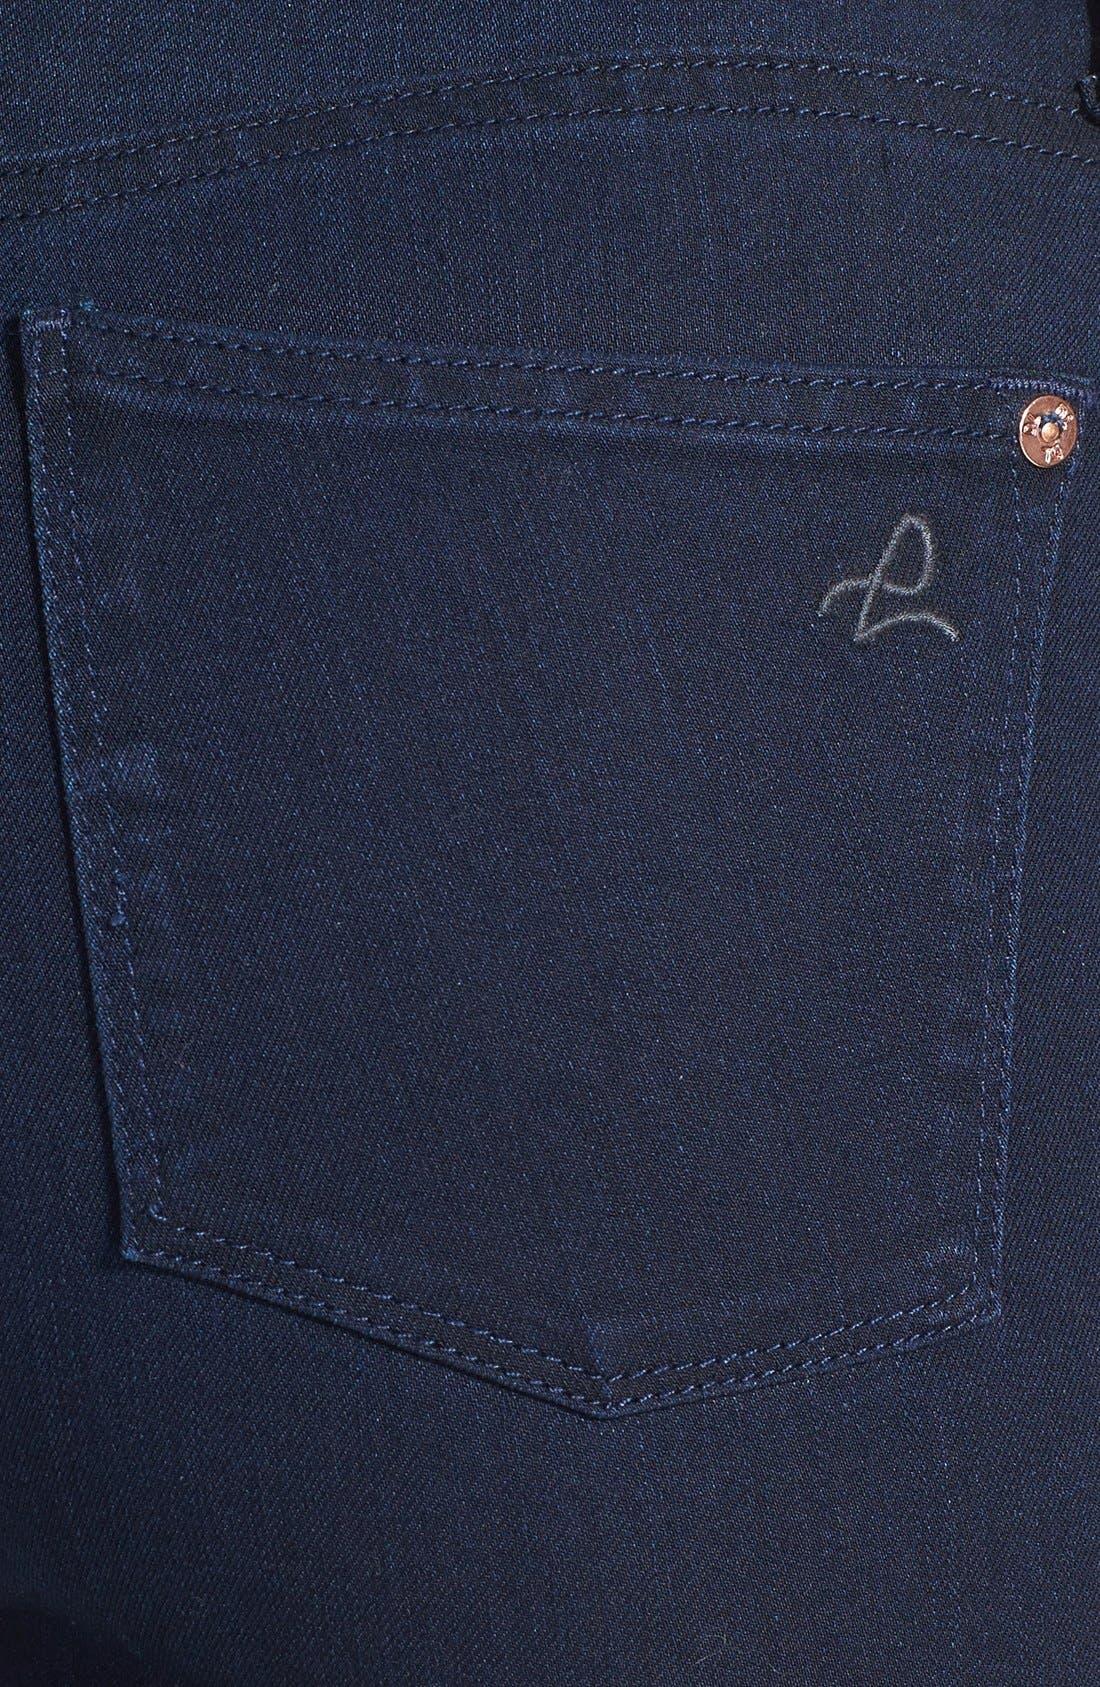 Alternate Image 3  - DL1961 'Bardot High Rise' Crop Jeans (Flat Iron)